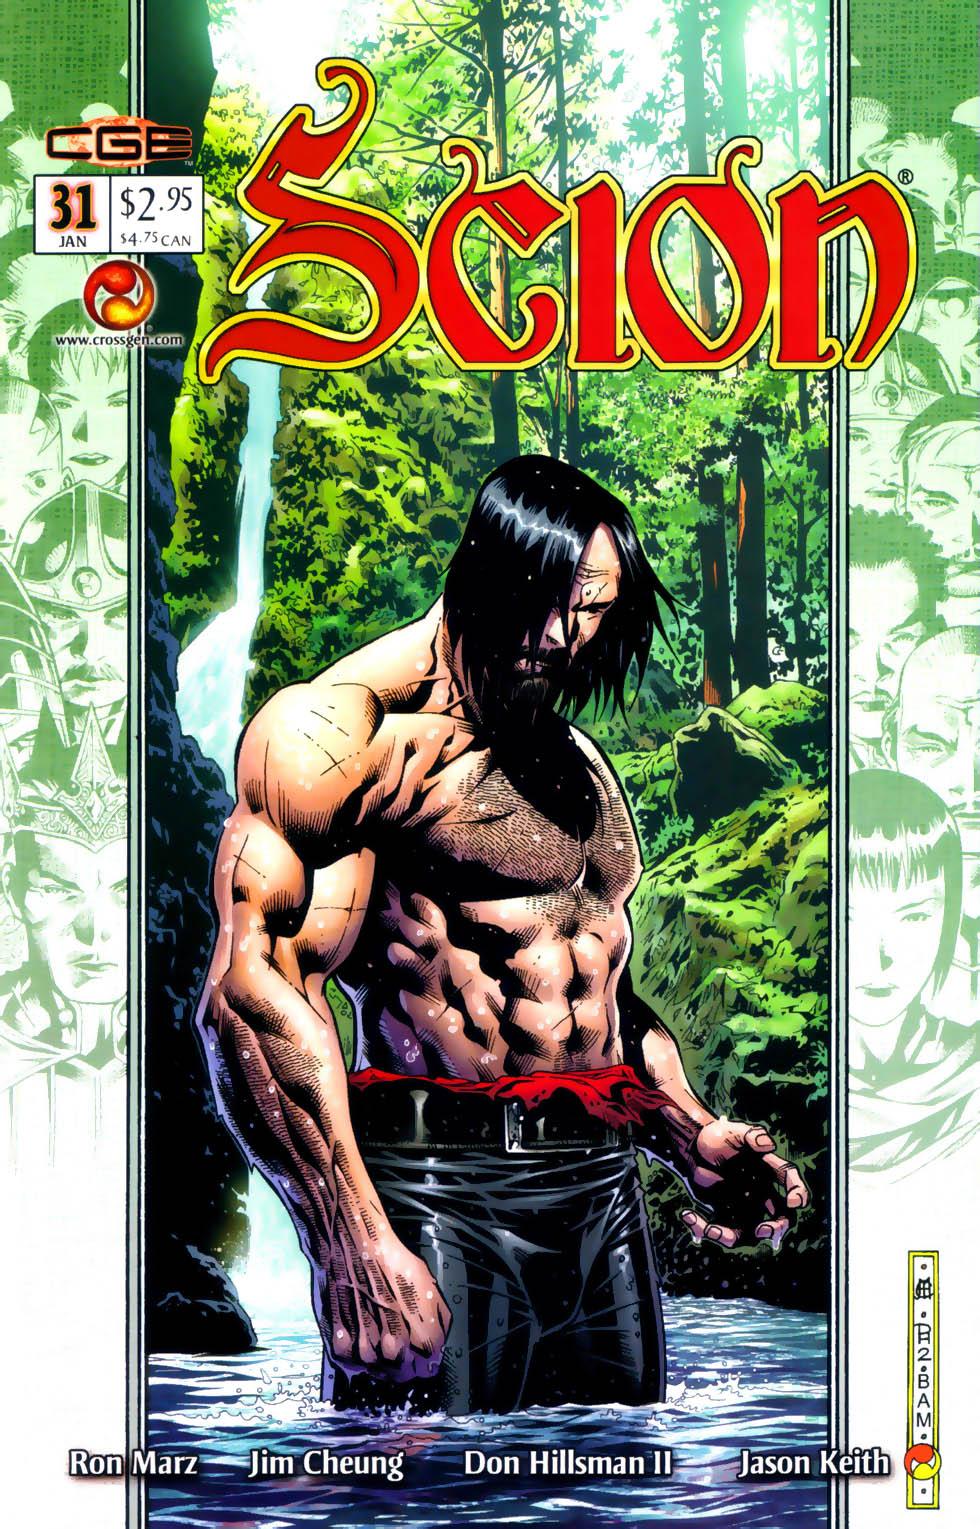 Read online Scion comic -  Issue #31 - 1